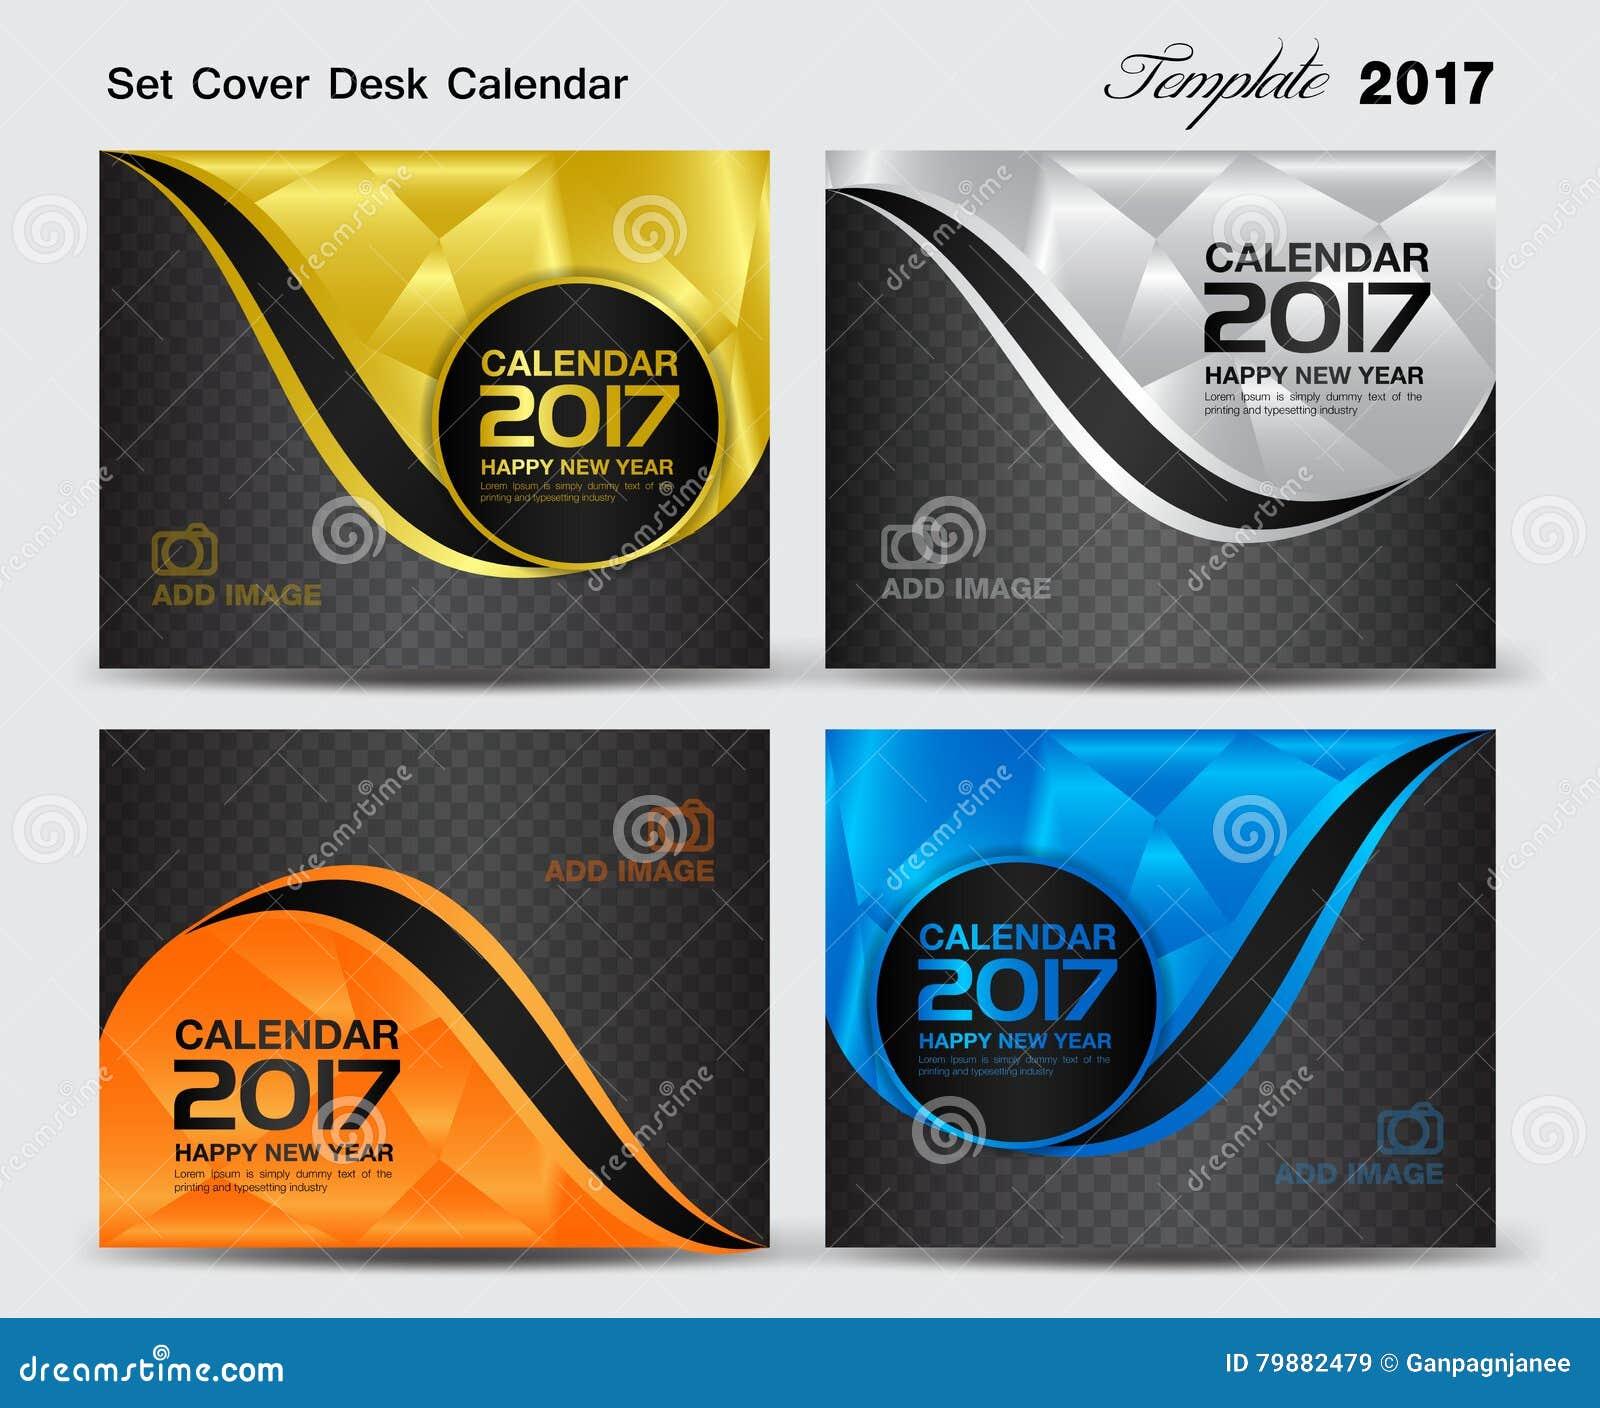 Calendar Cover : Set cover desk calendar year template design